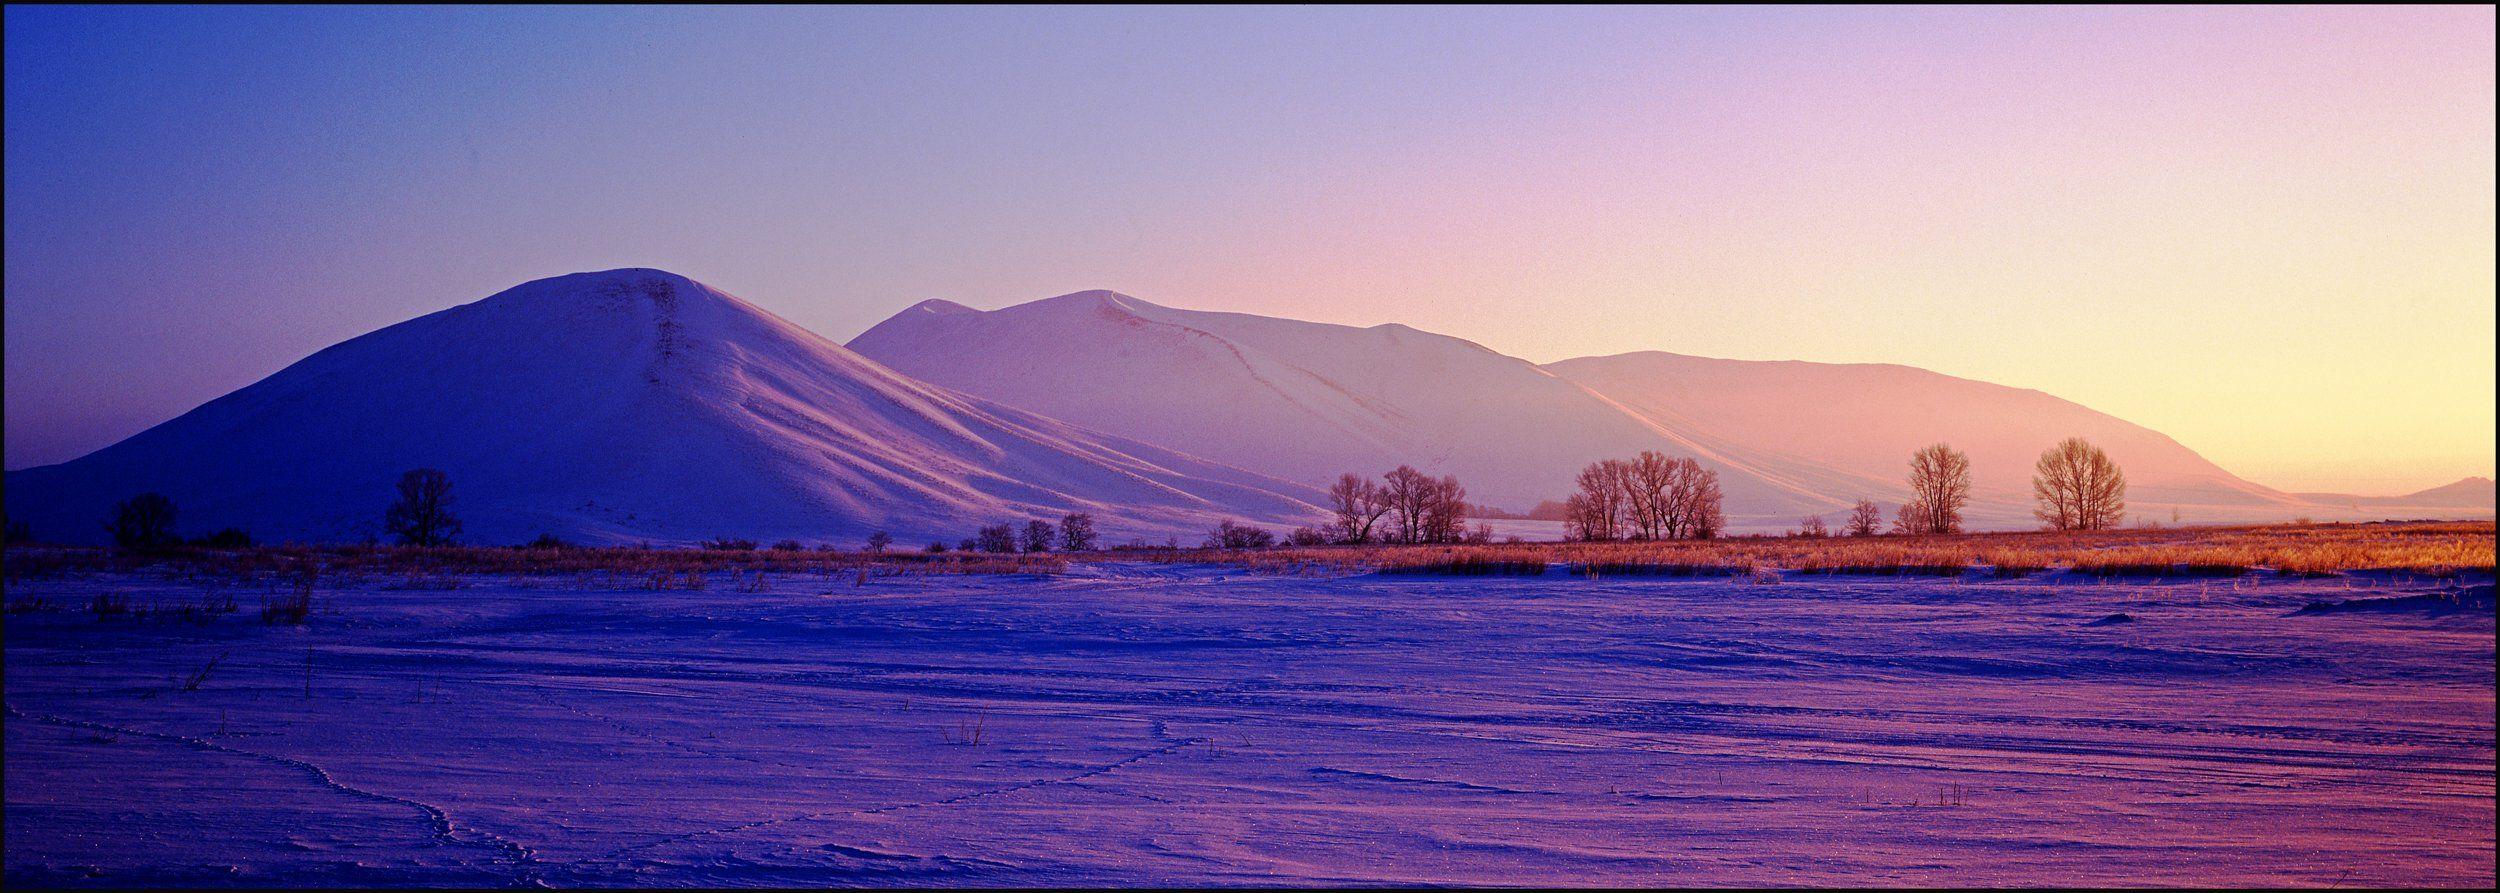 dawn,mountains,landscape,photofilm,mamiya,snow,oleg_grachev, Грачёв Олег